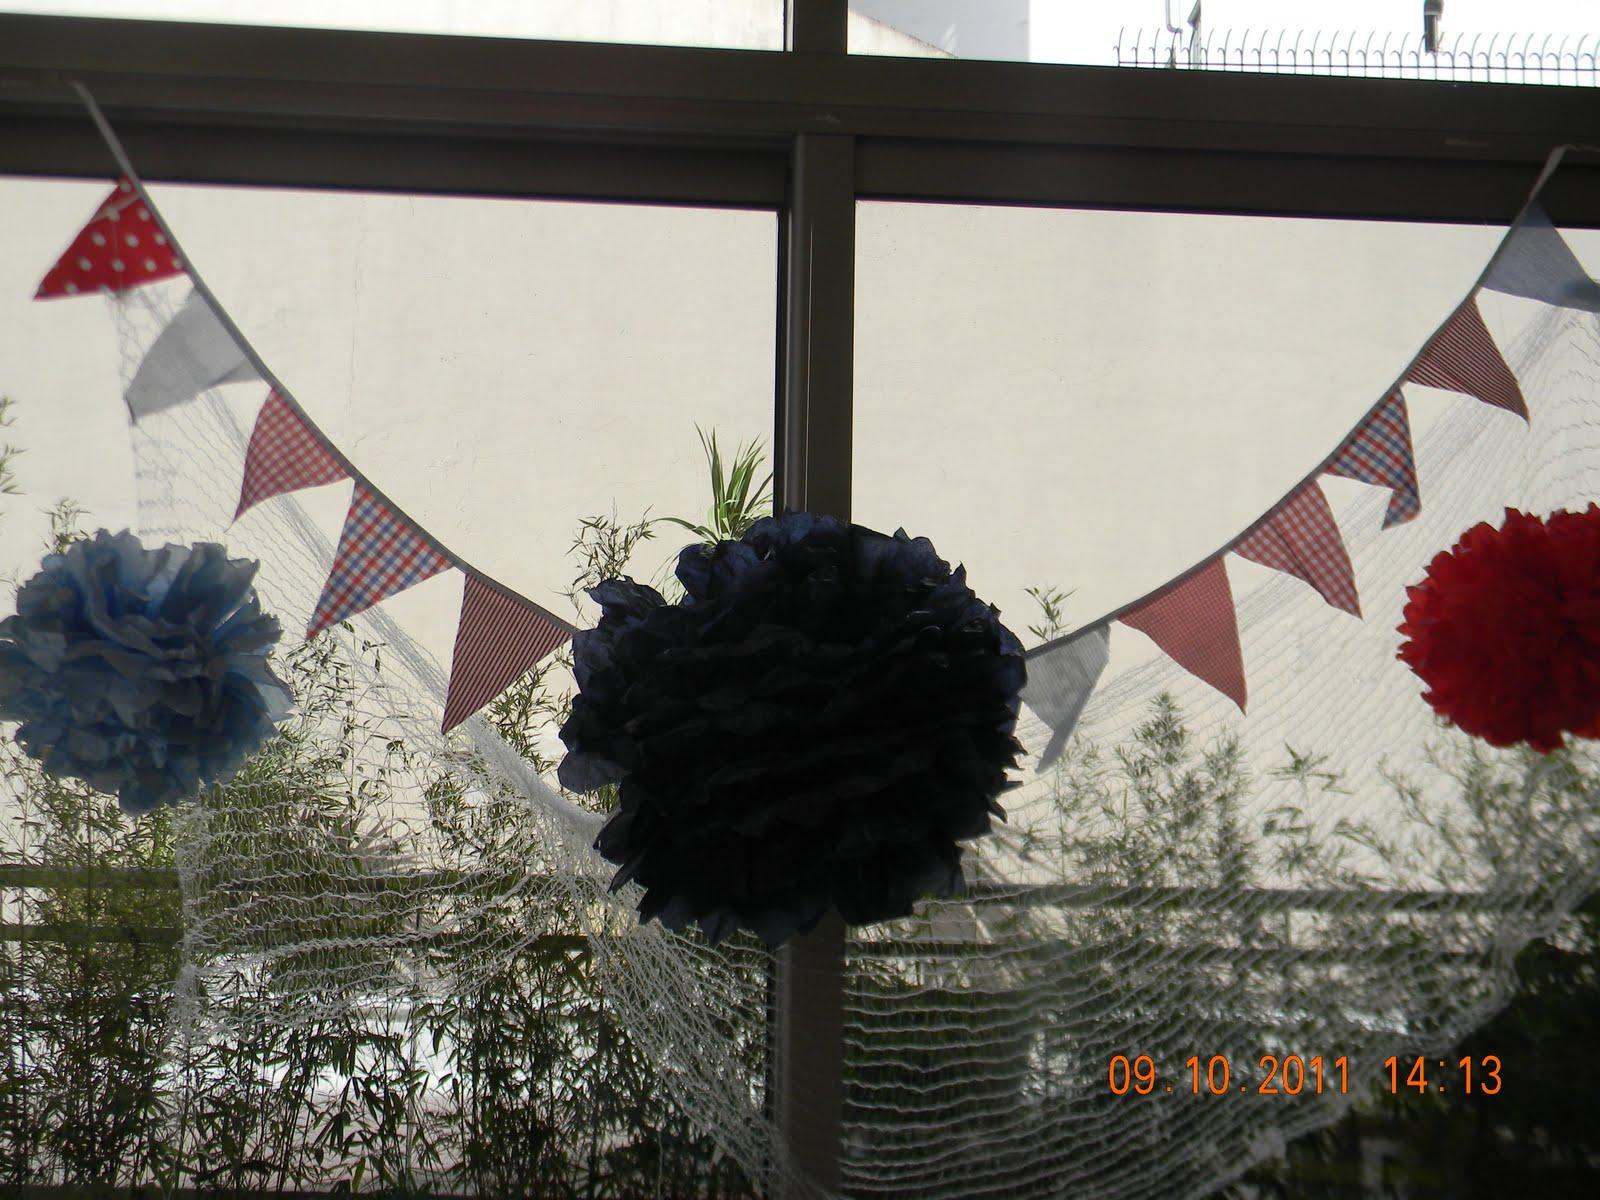 Lunes  19 De Septiembre De 2011